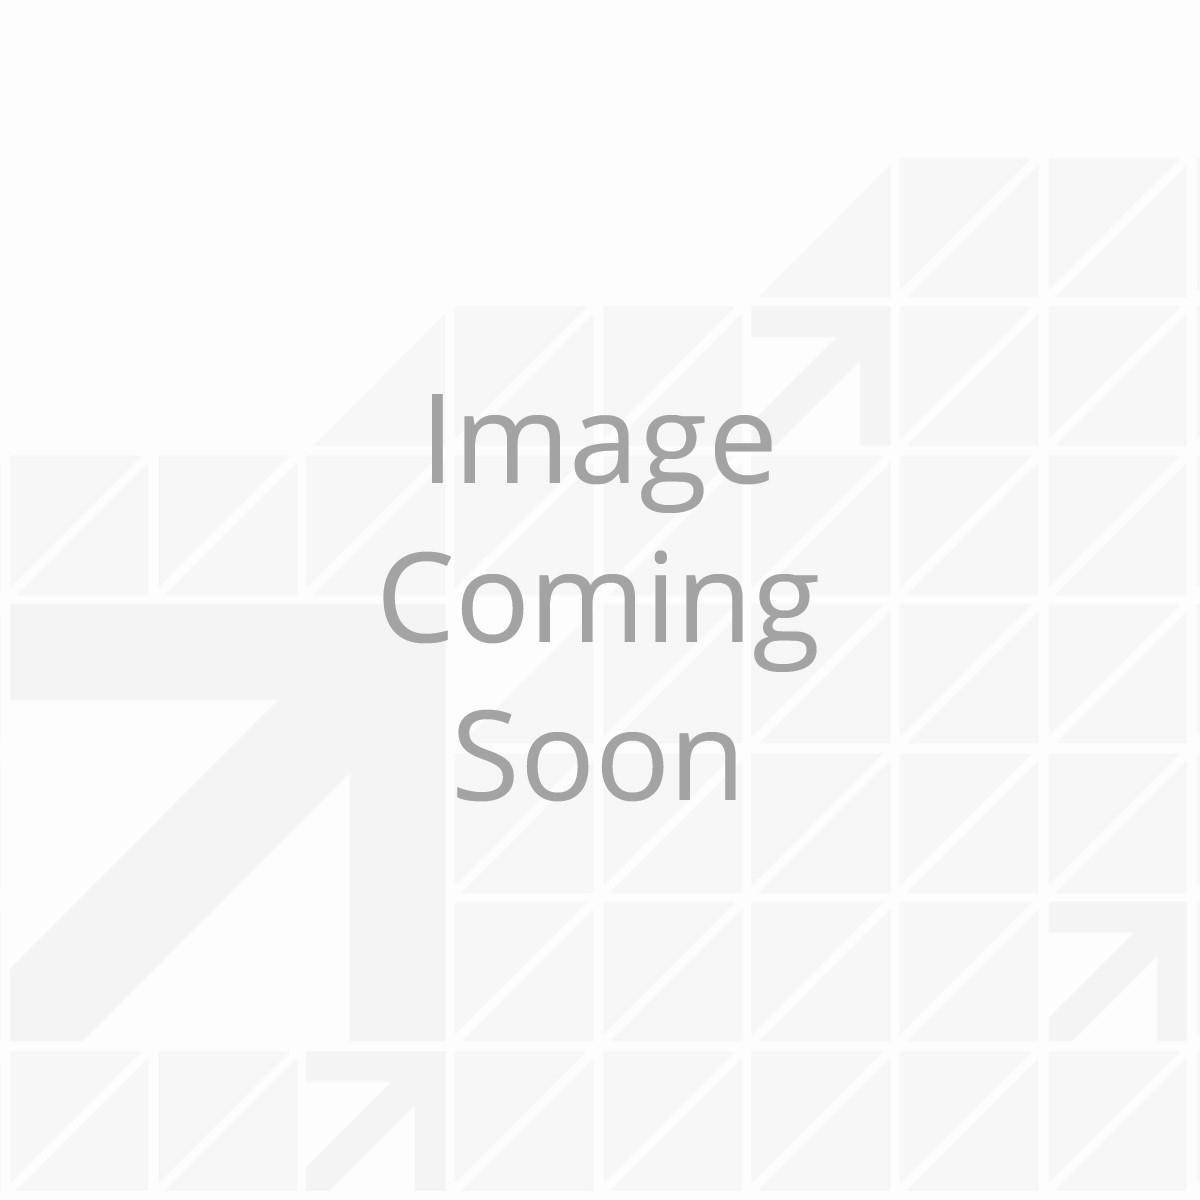 218210_-_jack_bracket_-_001